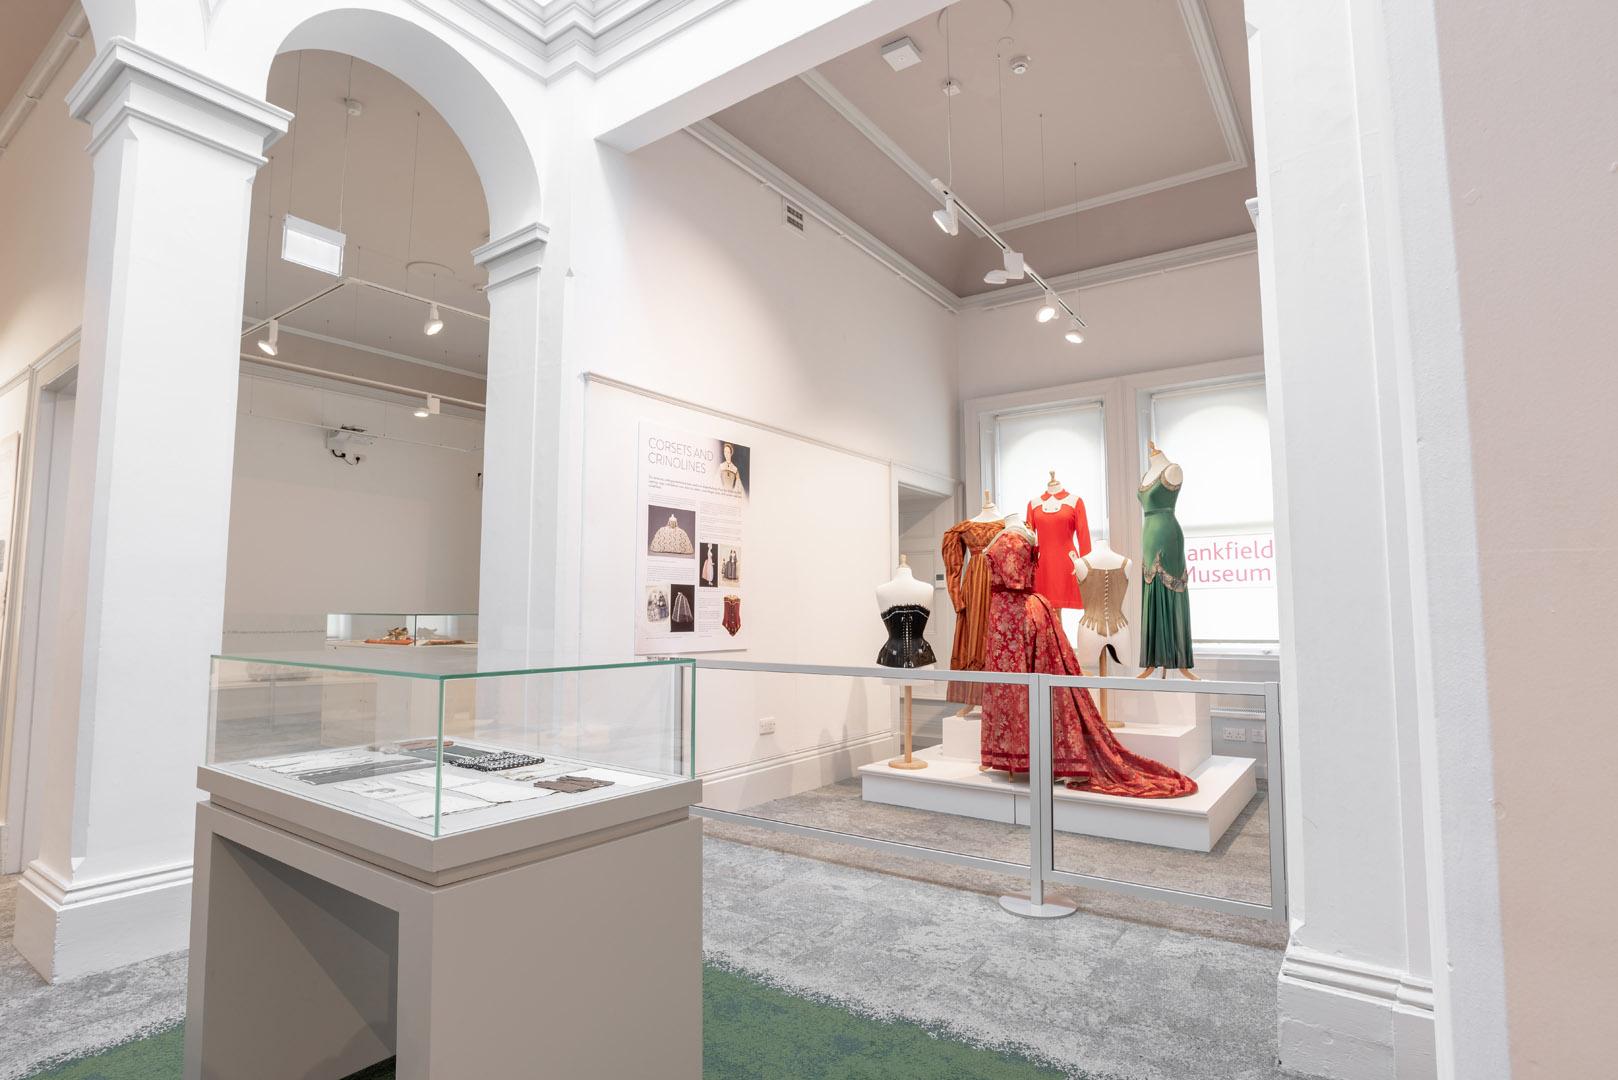 Bankfield Museum 16